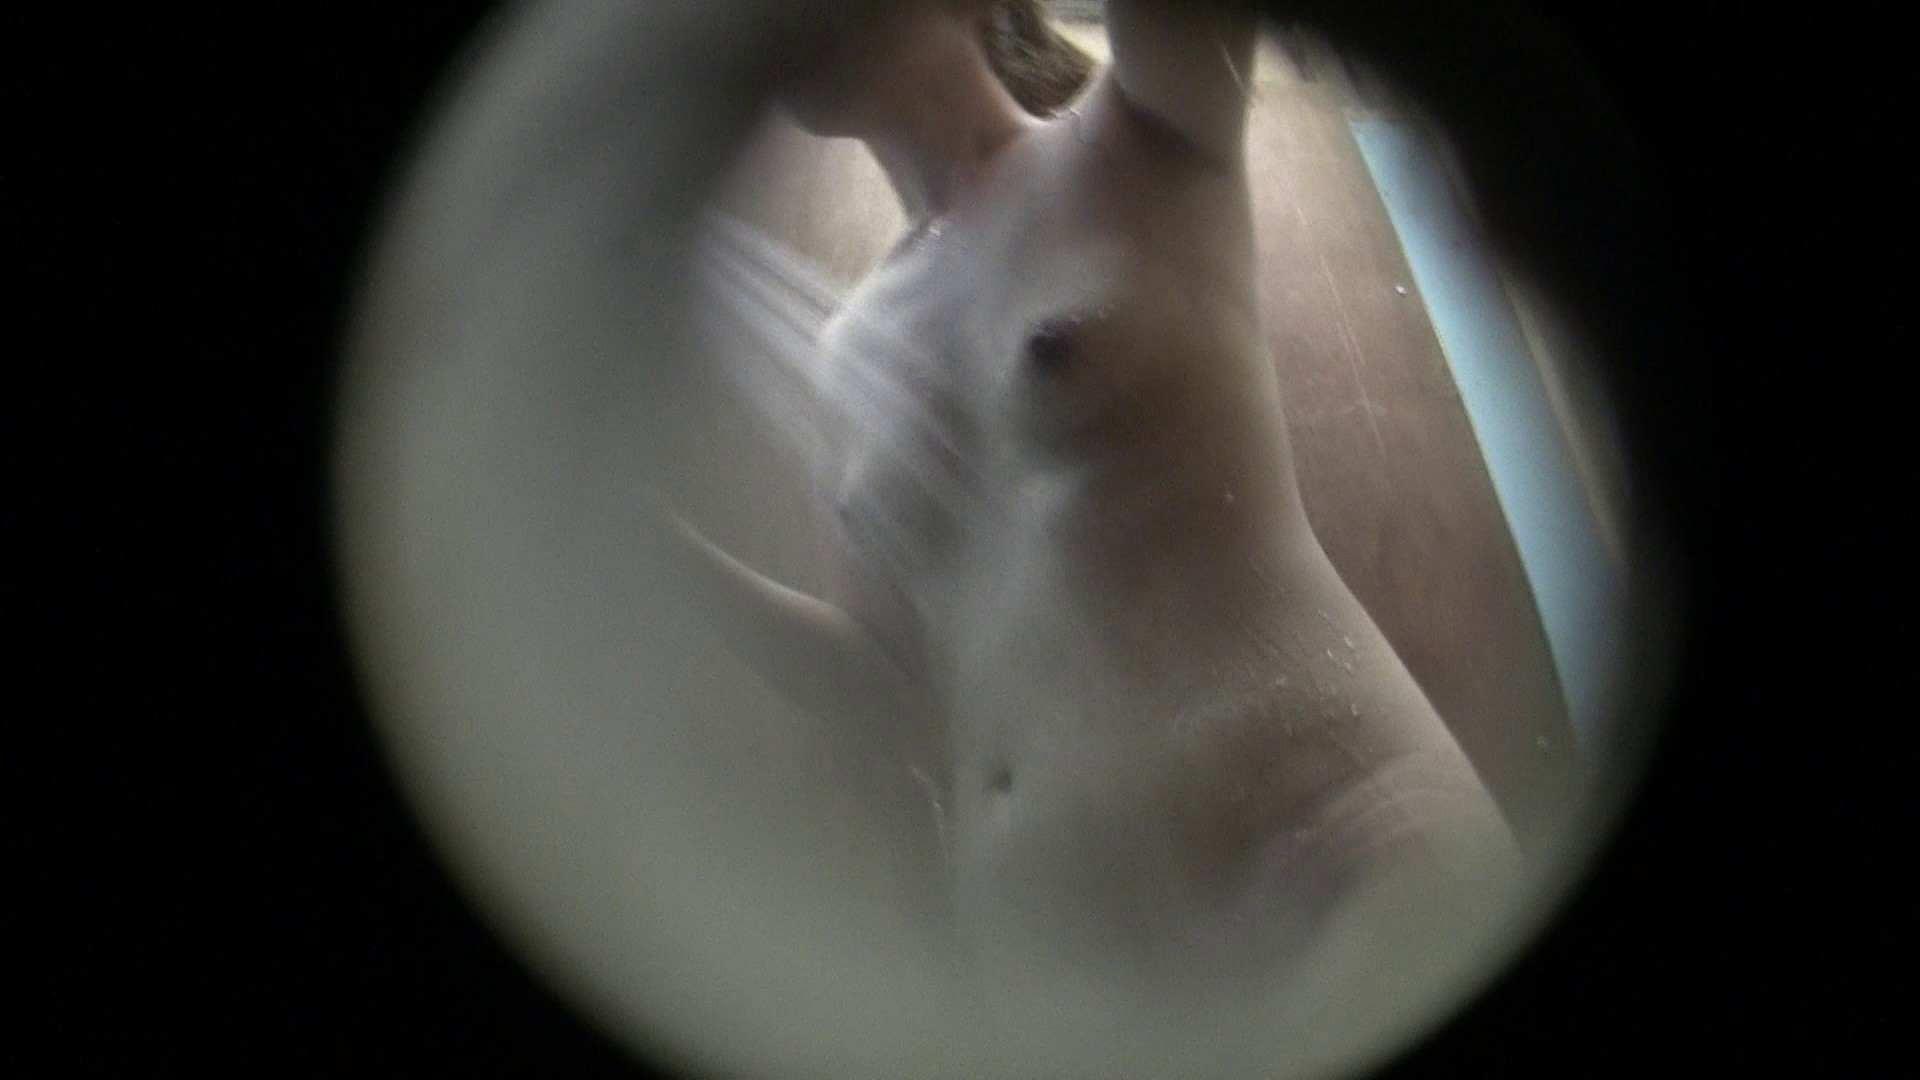 NO.01 胃下垂気味のへそピアスギャル 美乳 おまんこ無修正動画無料 58画像 27